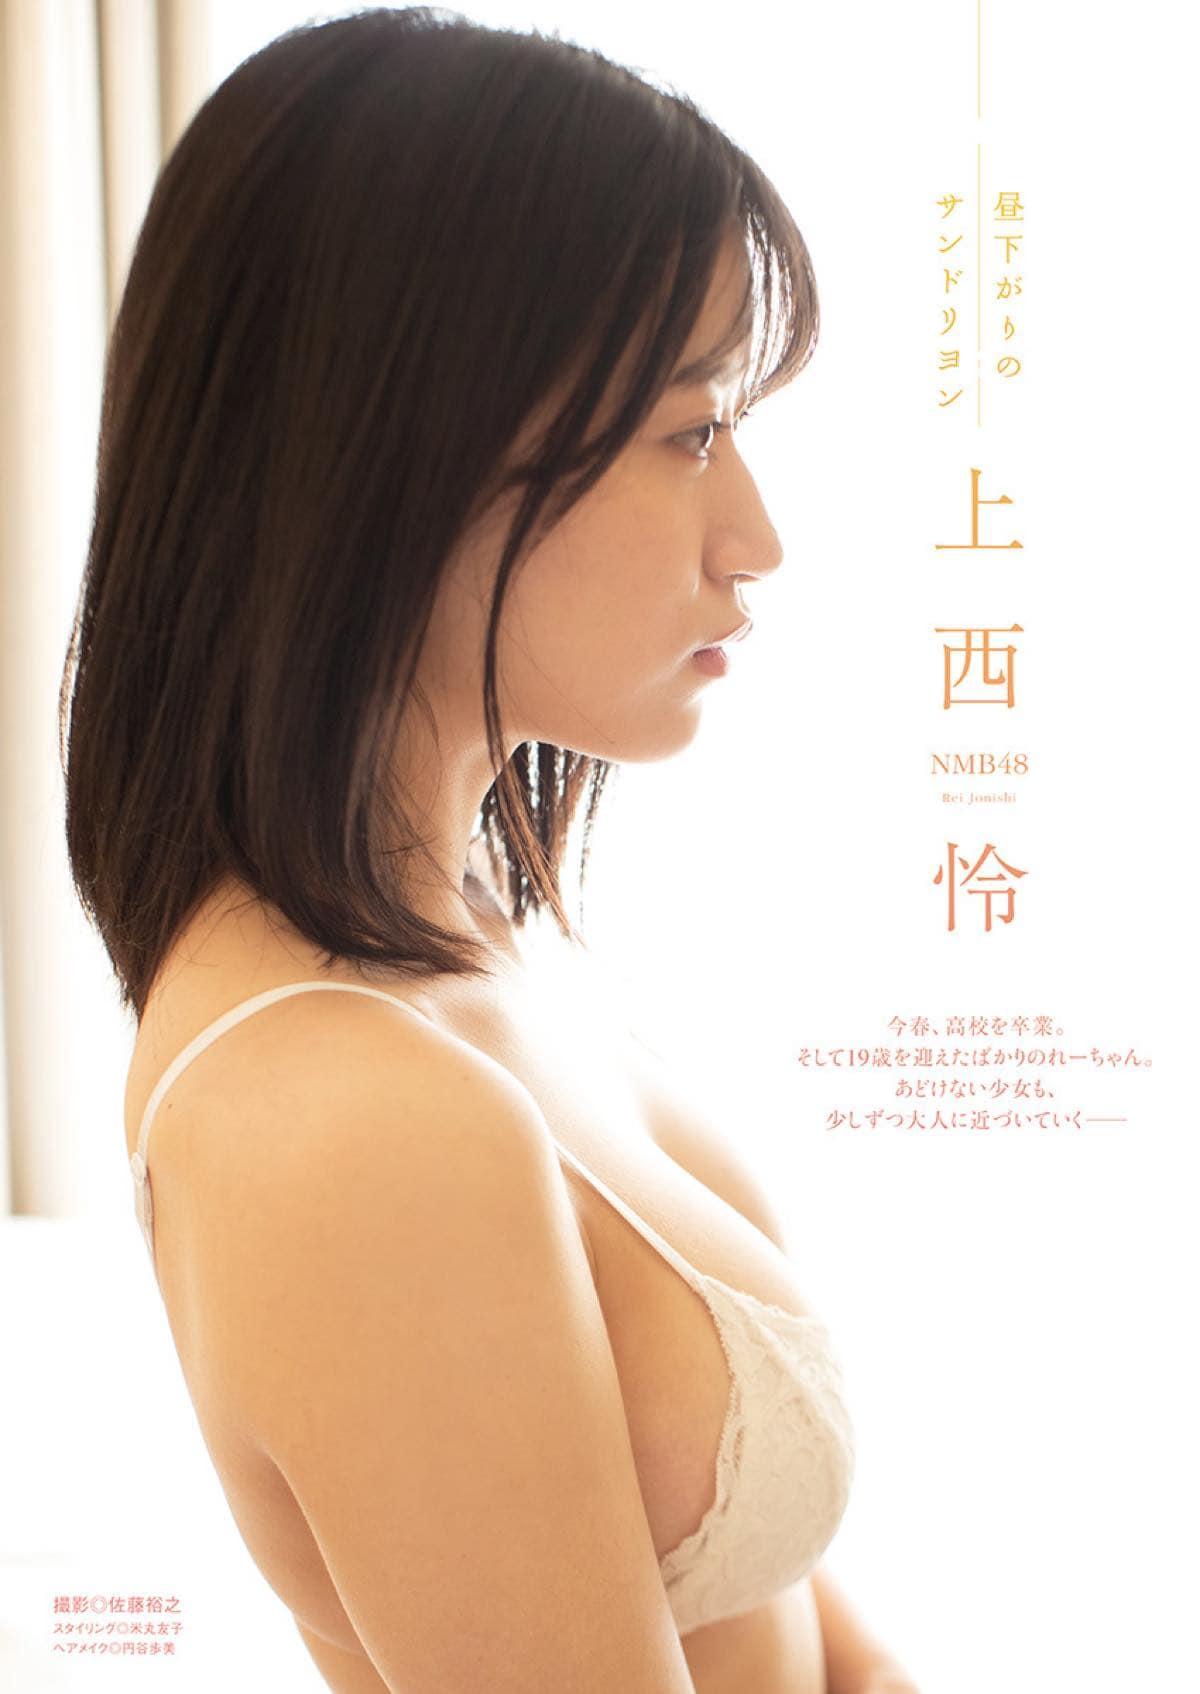 NMB48上西怜が『漫画アクション』の表紙巻頭グラビアに登場! 【写真4枚】の画像002